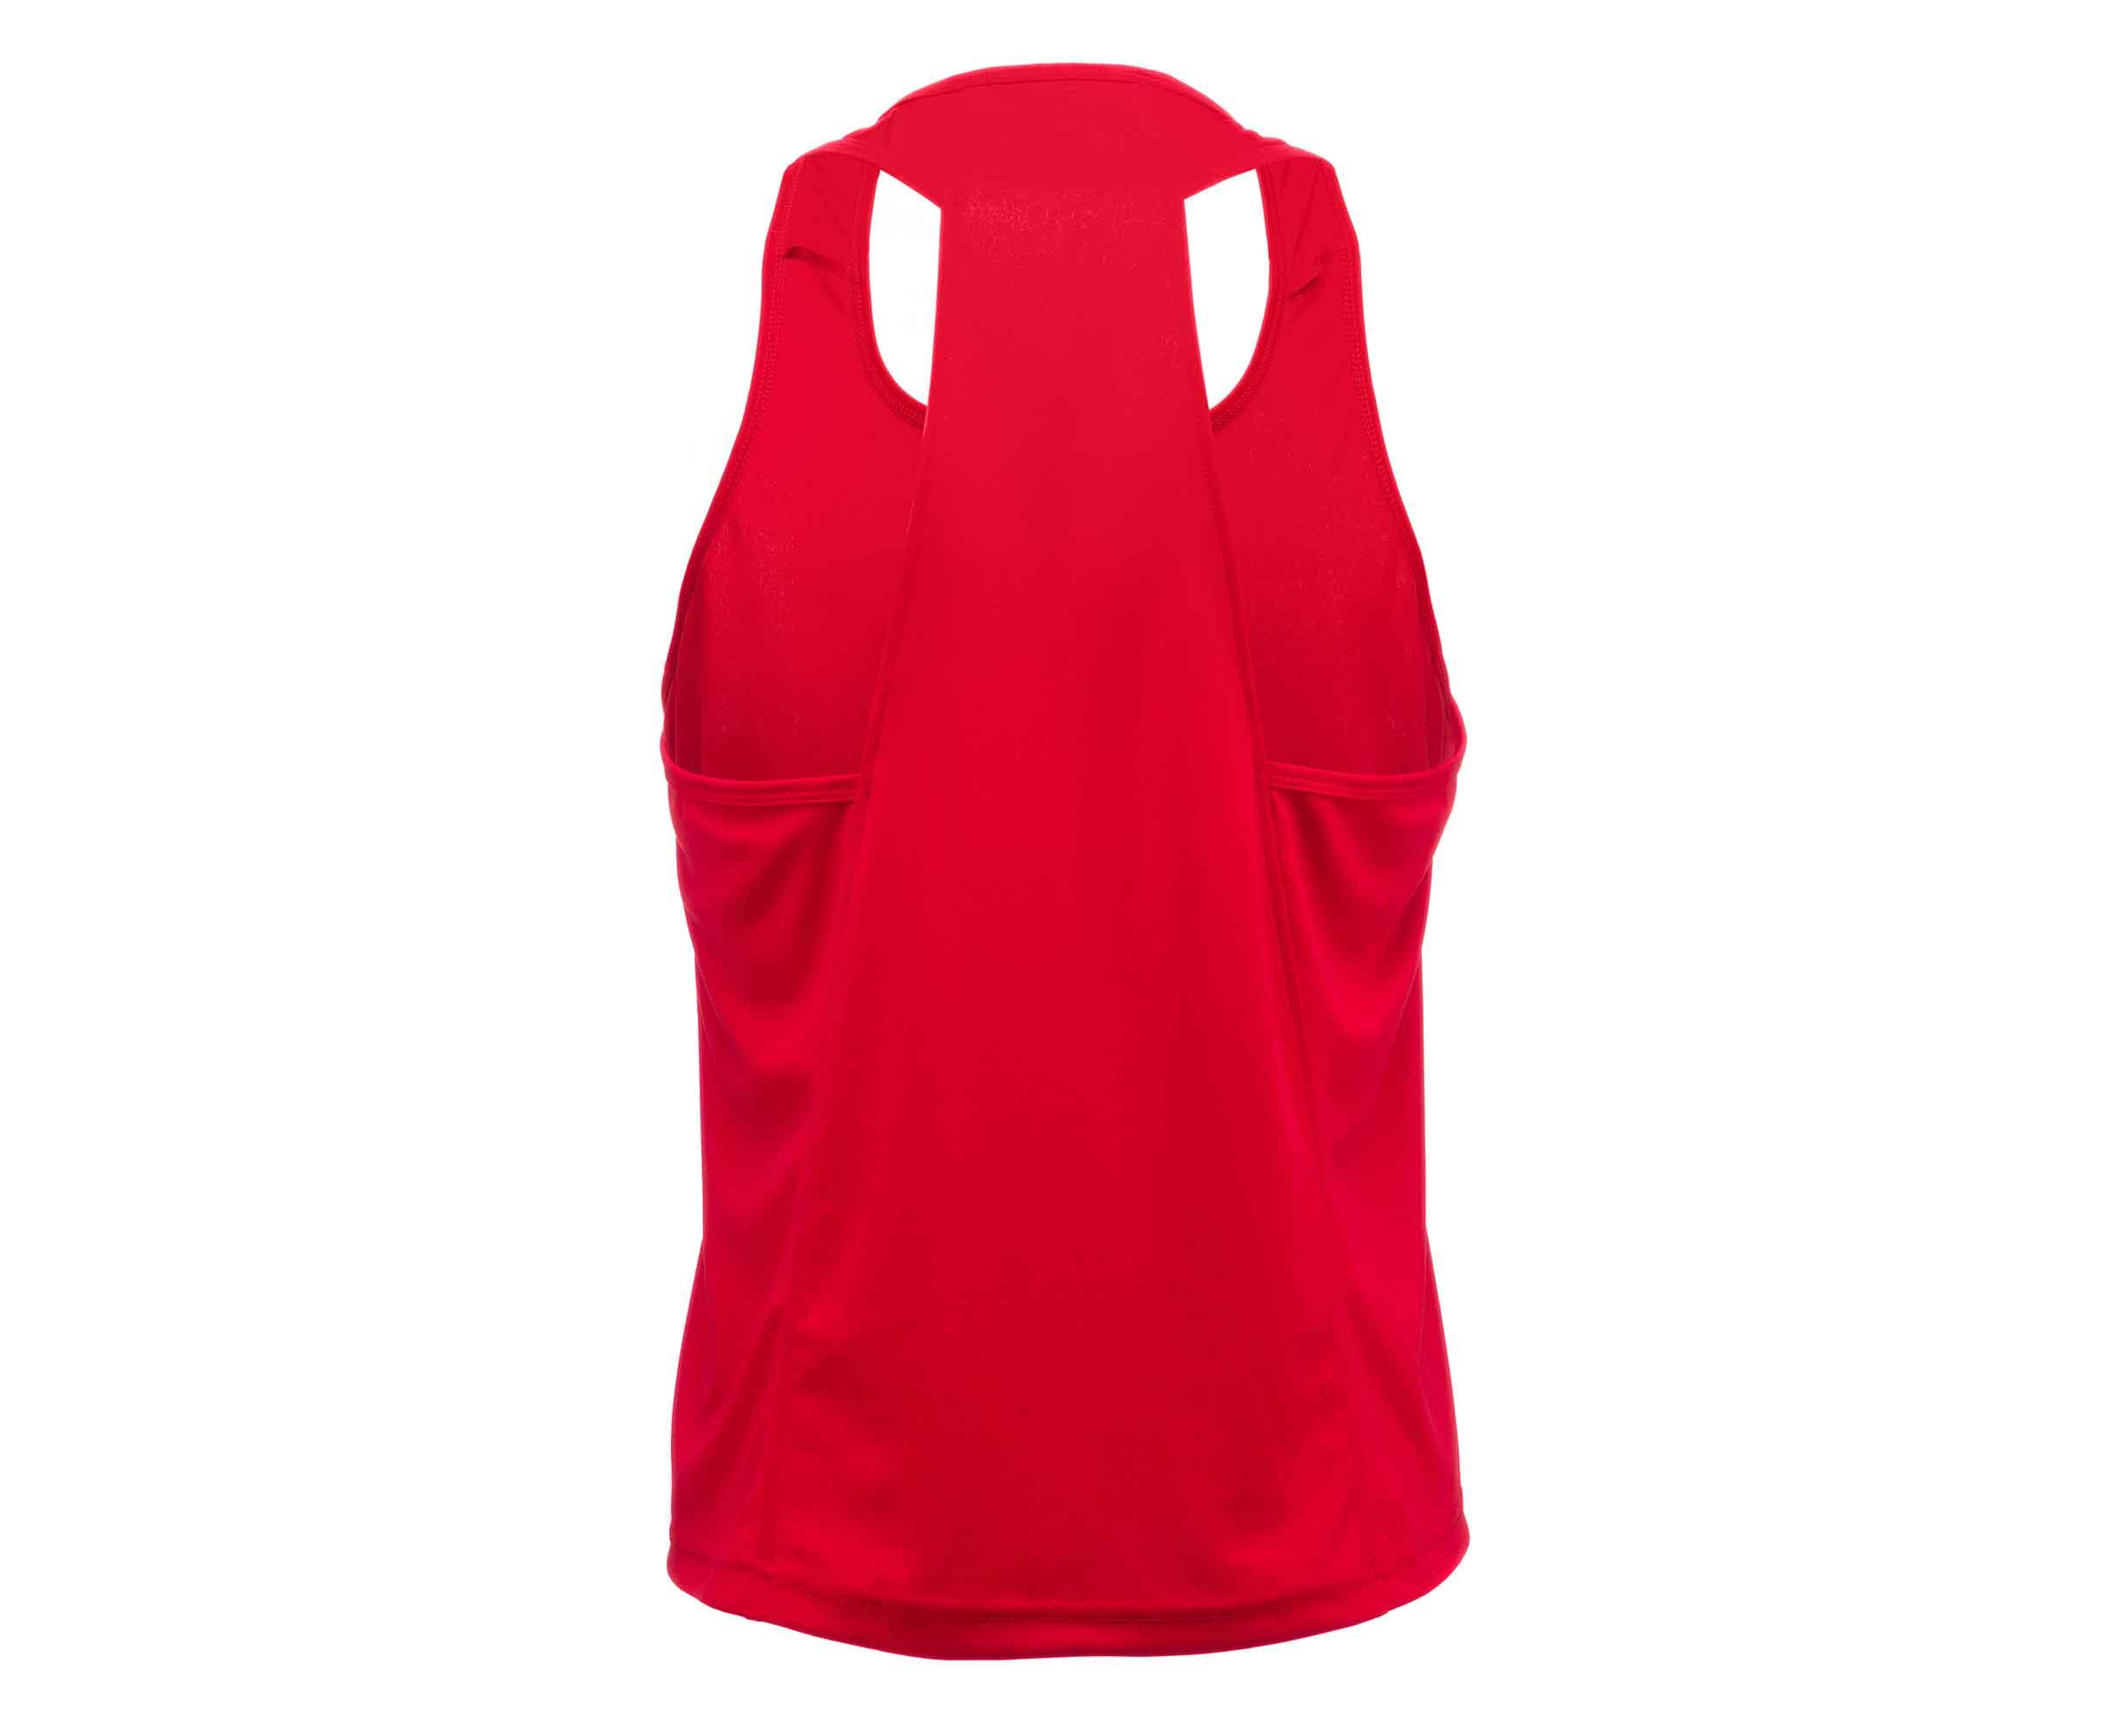 Майка боксерская Adidas Clinch Olimp красная 128